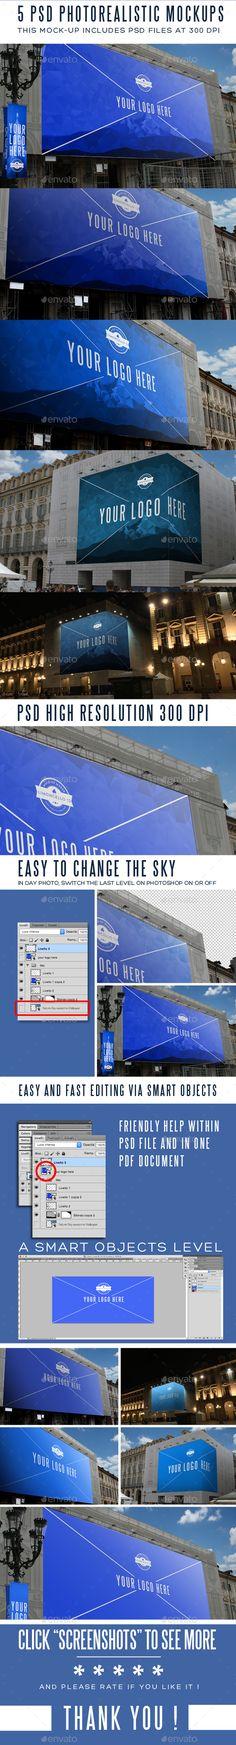 5 Photorealistic Billboard Banner Mock-Ups #billboard #mockup Download: http://graphicriver.net/item/5-photorealistic-billboard-banner-mockups/11616807?ref=ksioks